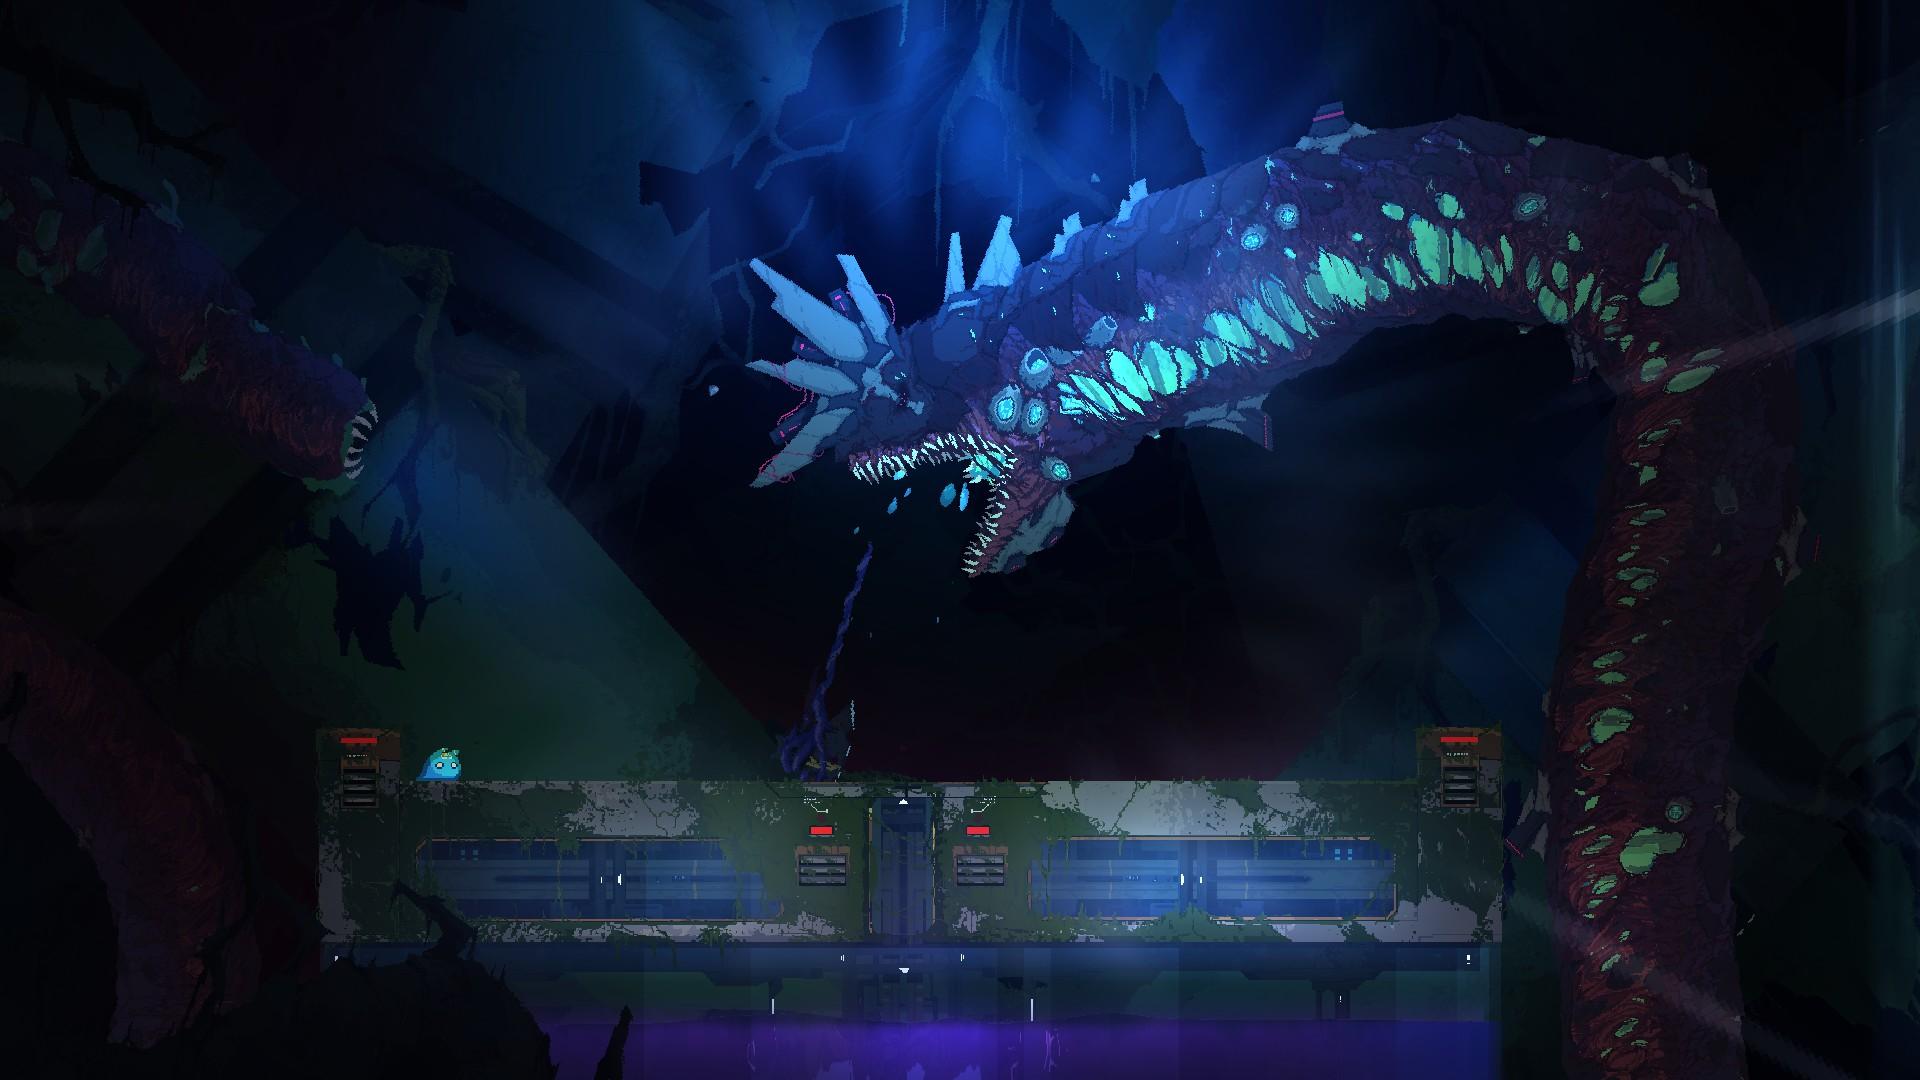 [PCゲーム]MO:Astrayを遊んでみよう7